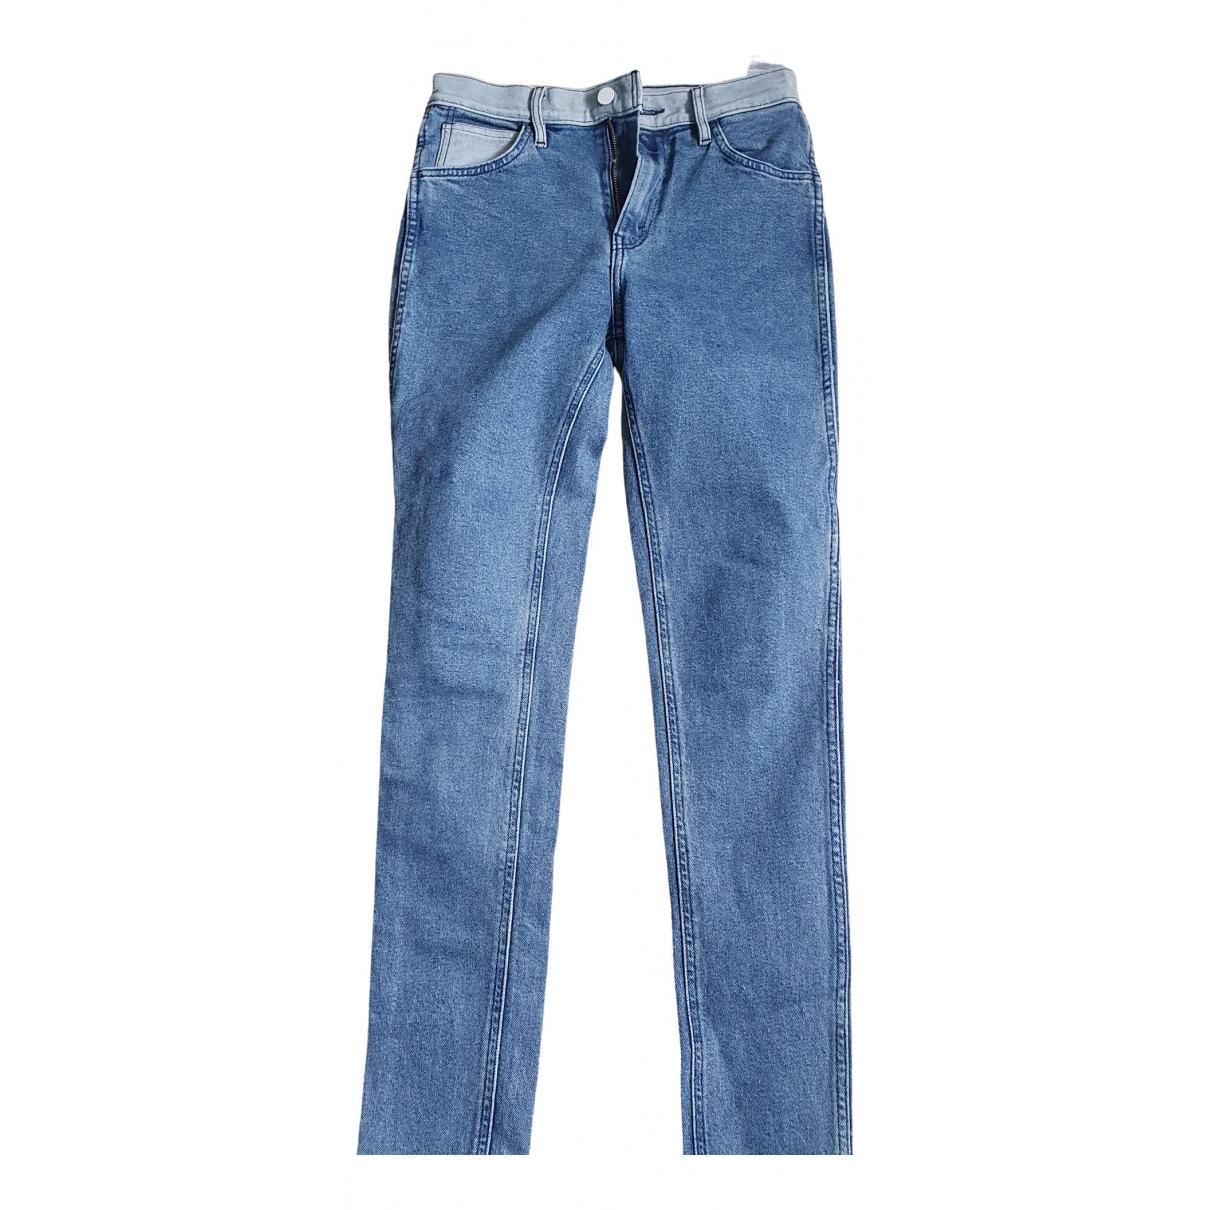 Levi's \N Denim - Jeans Jeans for Women 36 FR